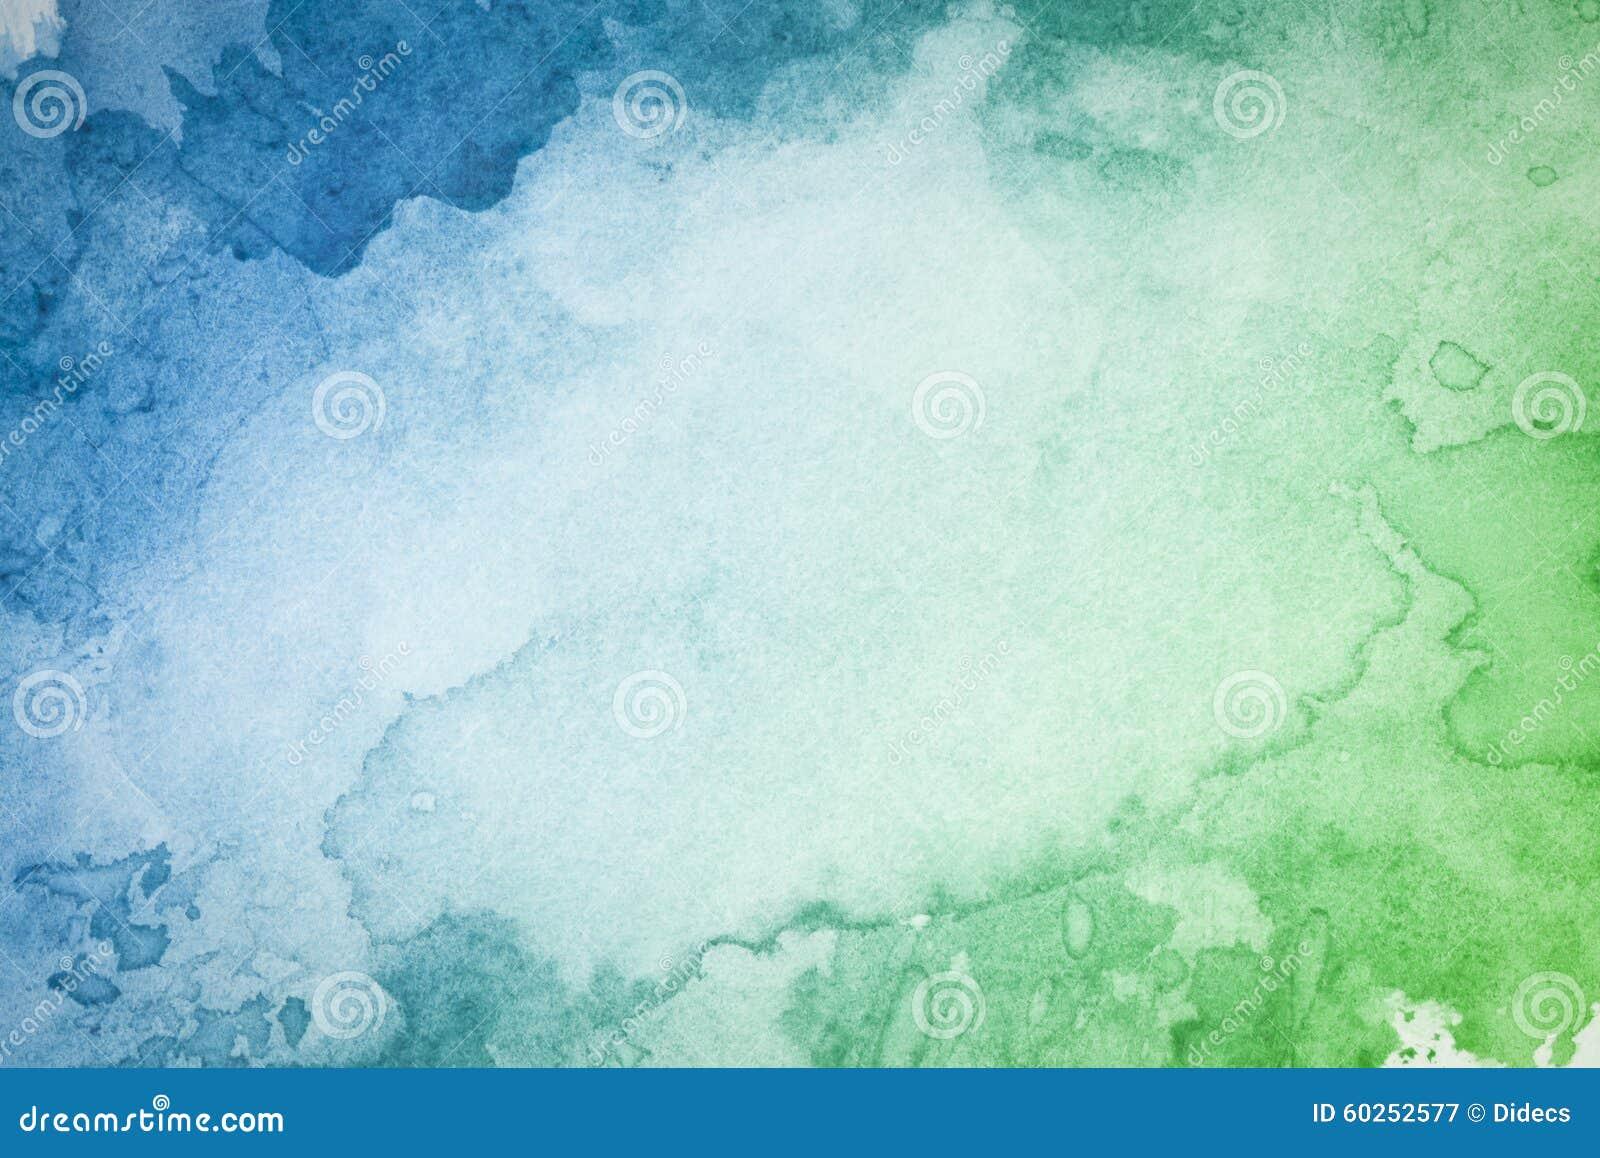 Abstracte artistieke groenachtig blauwe waterverfachtergrond